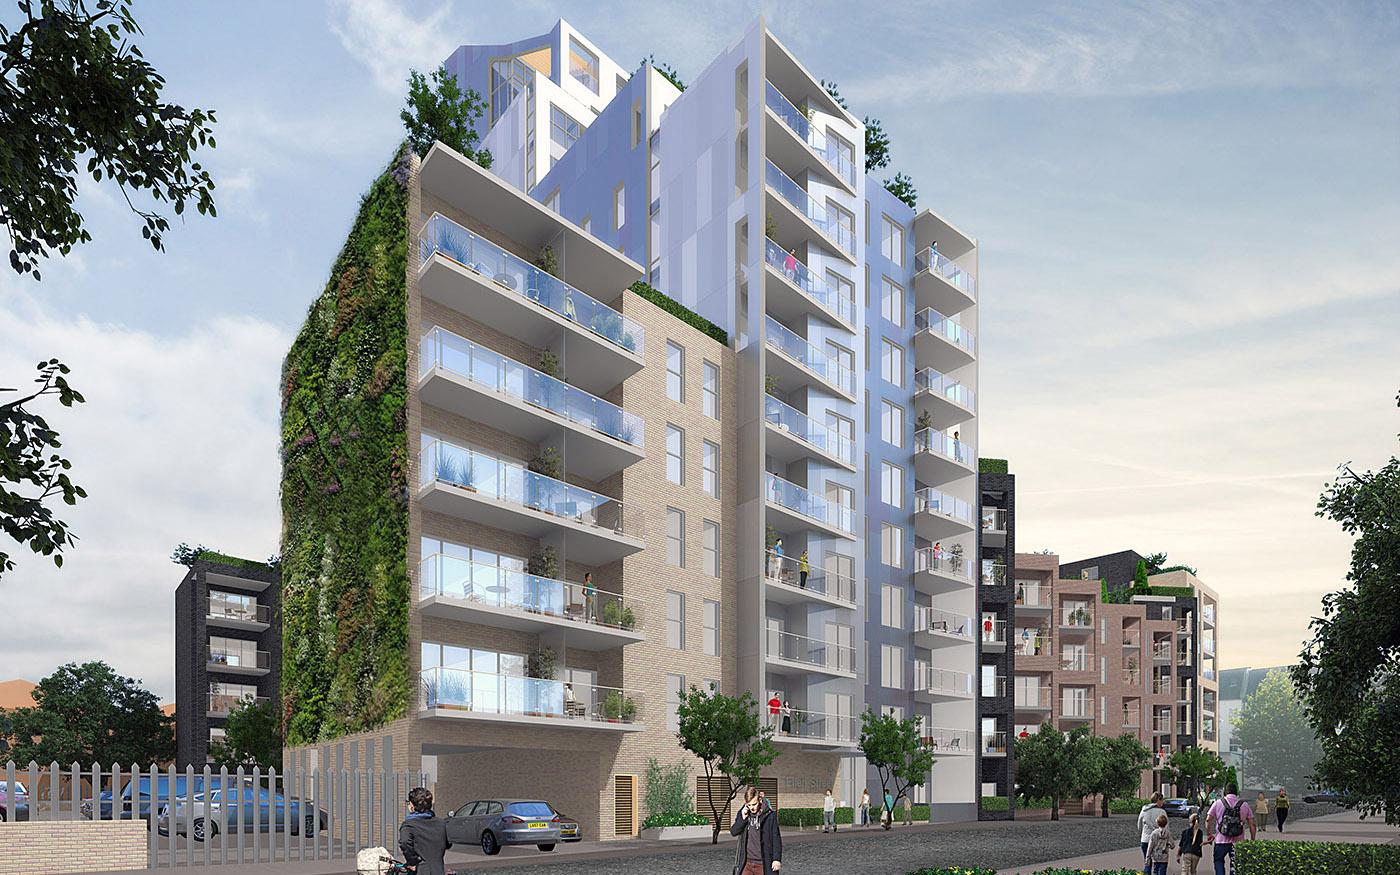 Housing Impact 1